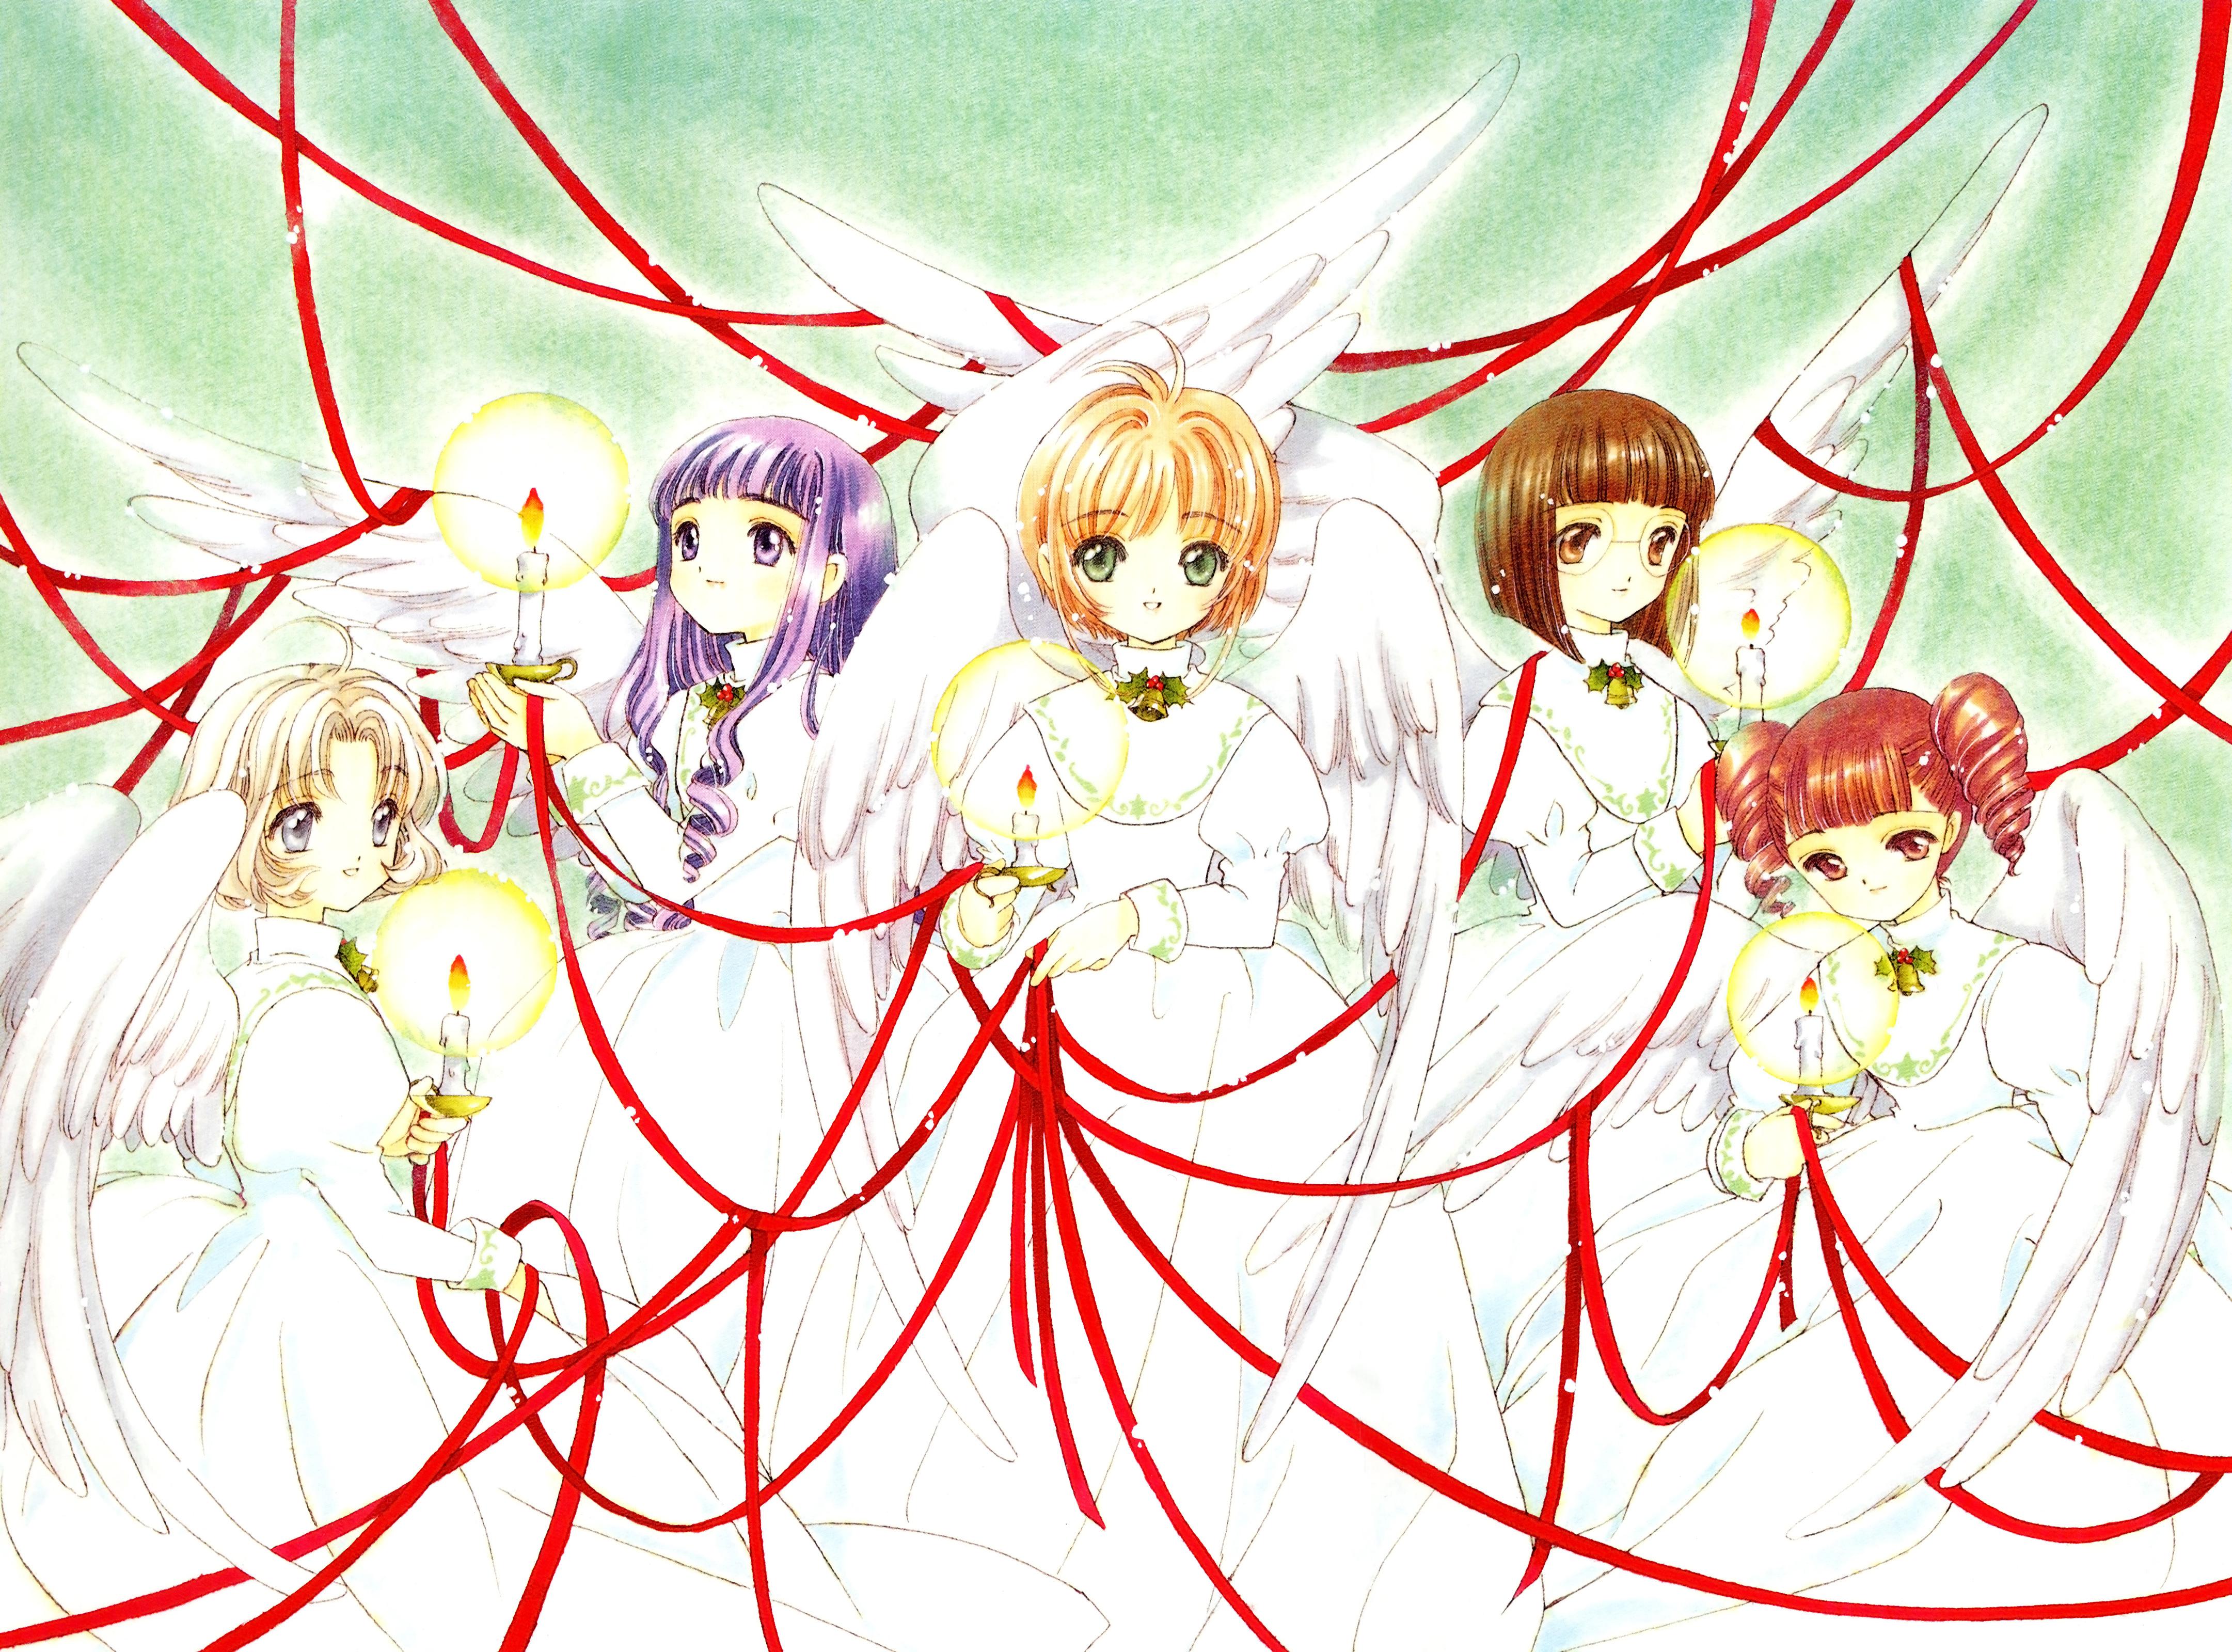 Cardcaptor Sakura 4k Ultra Hd Wallpaper Background Image 4323x30 Id Wallpaper Abyss